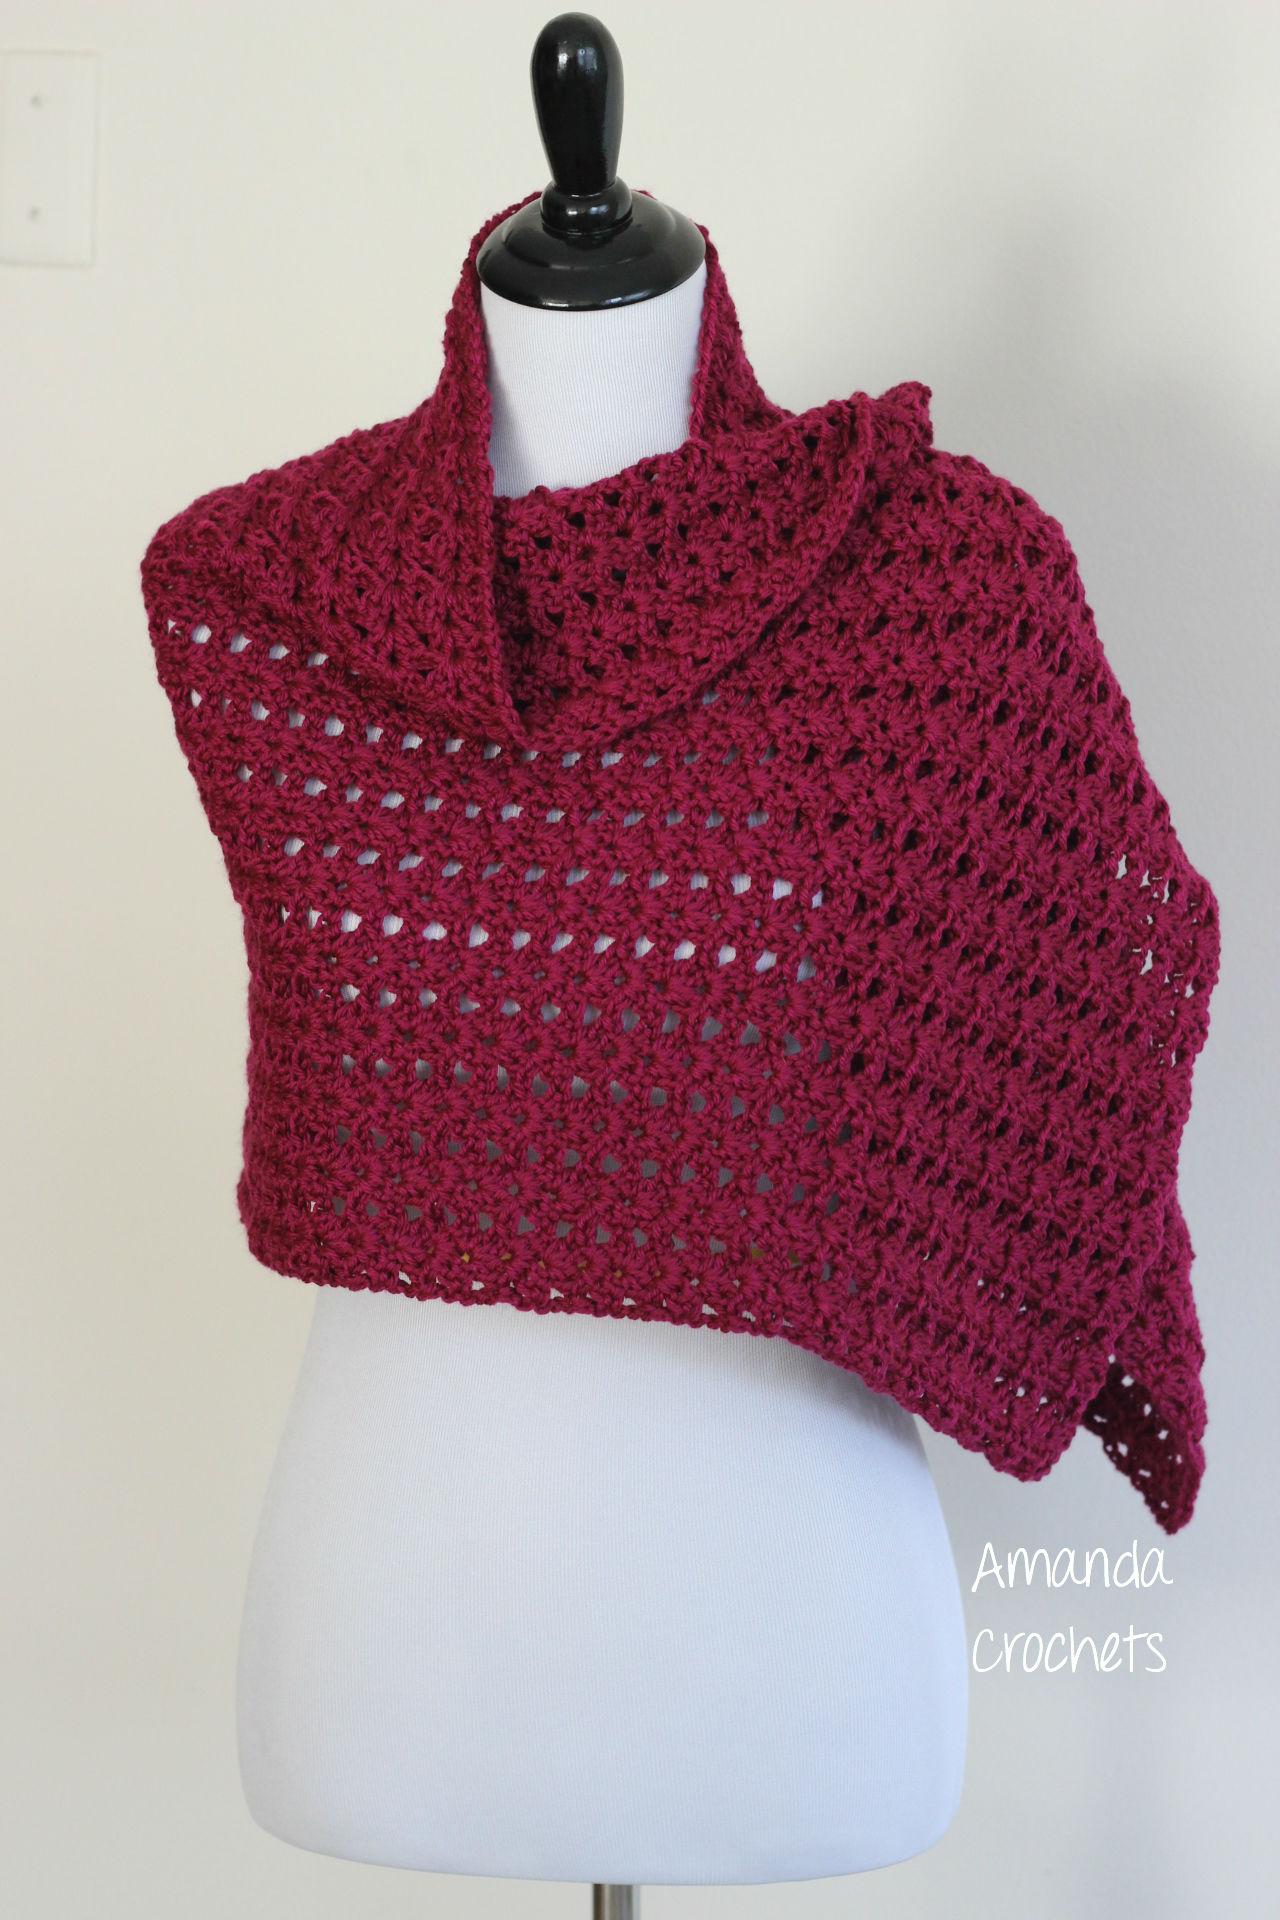 iris shawl pattern amanda crochets. Black Bedroom Furniture Sets. Home Design Ideas